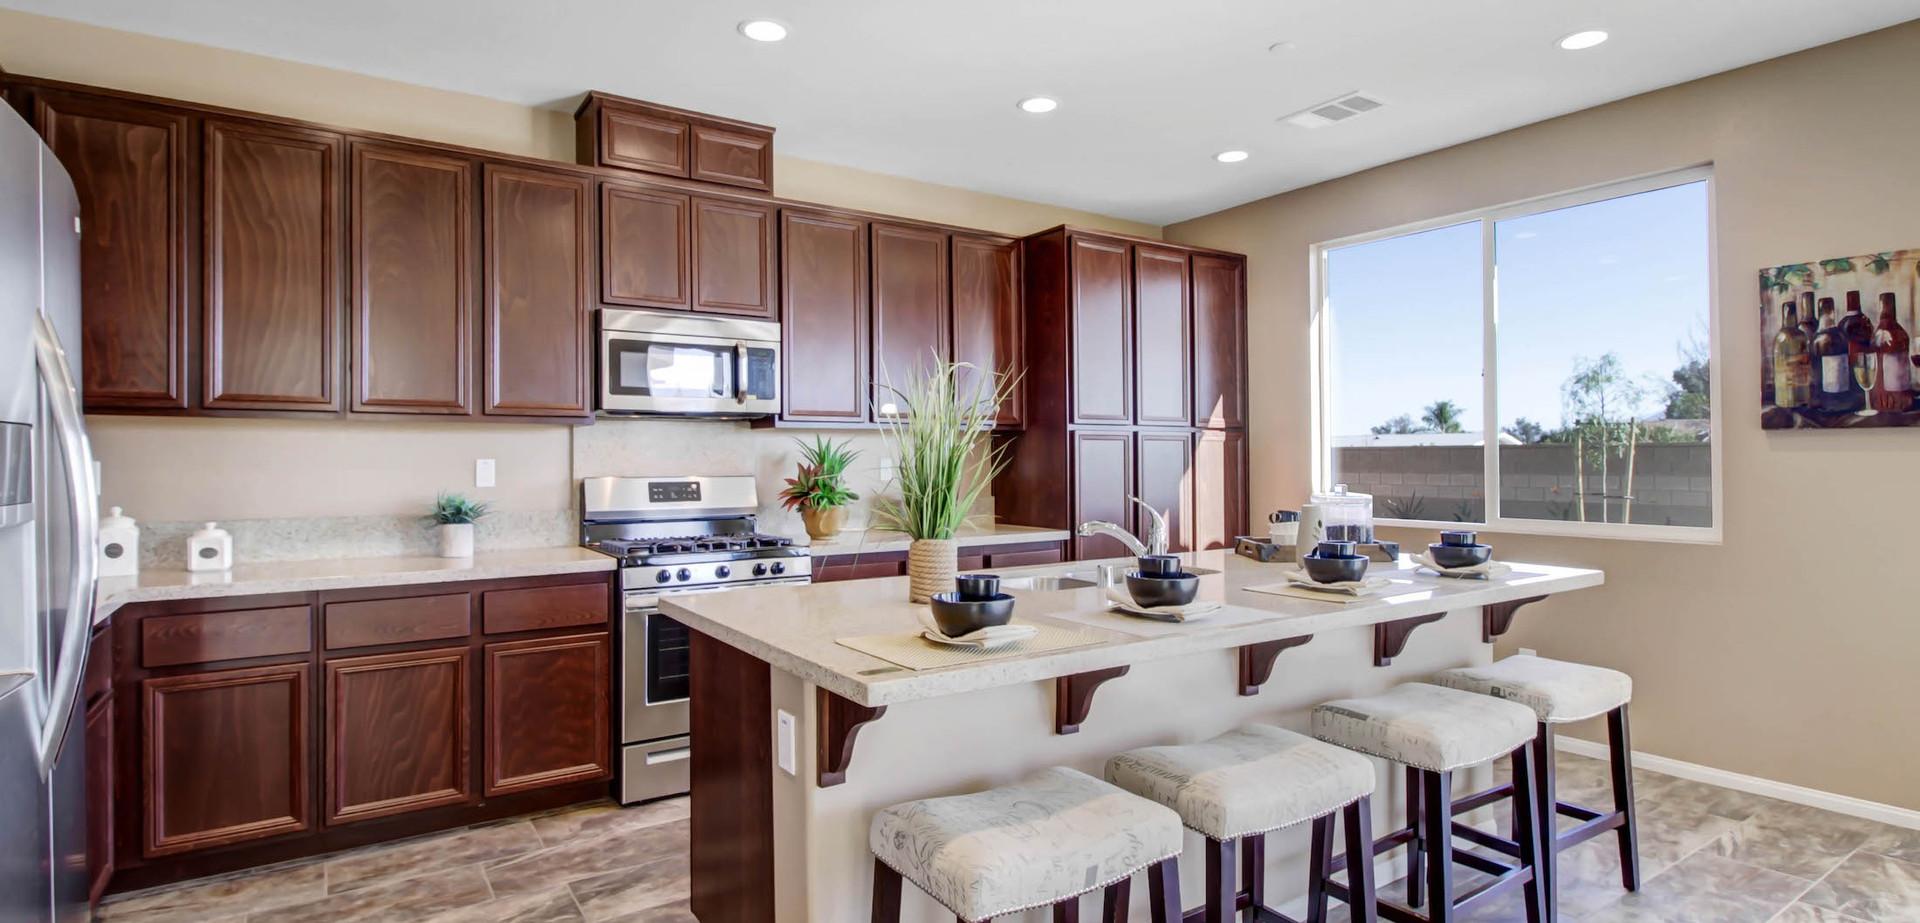 model-2 kitchen-4 2200x1500.jpg